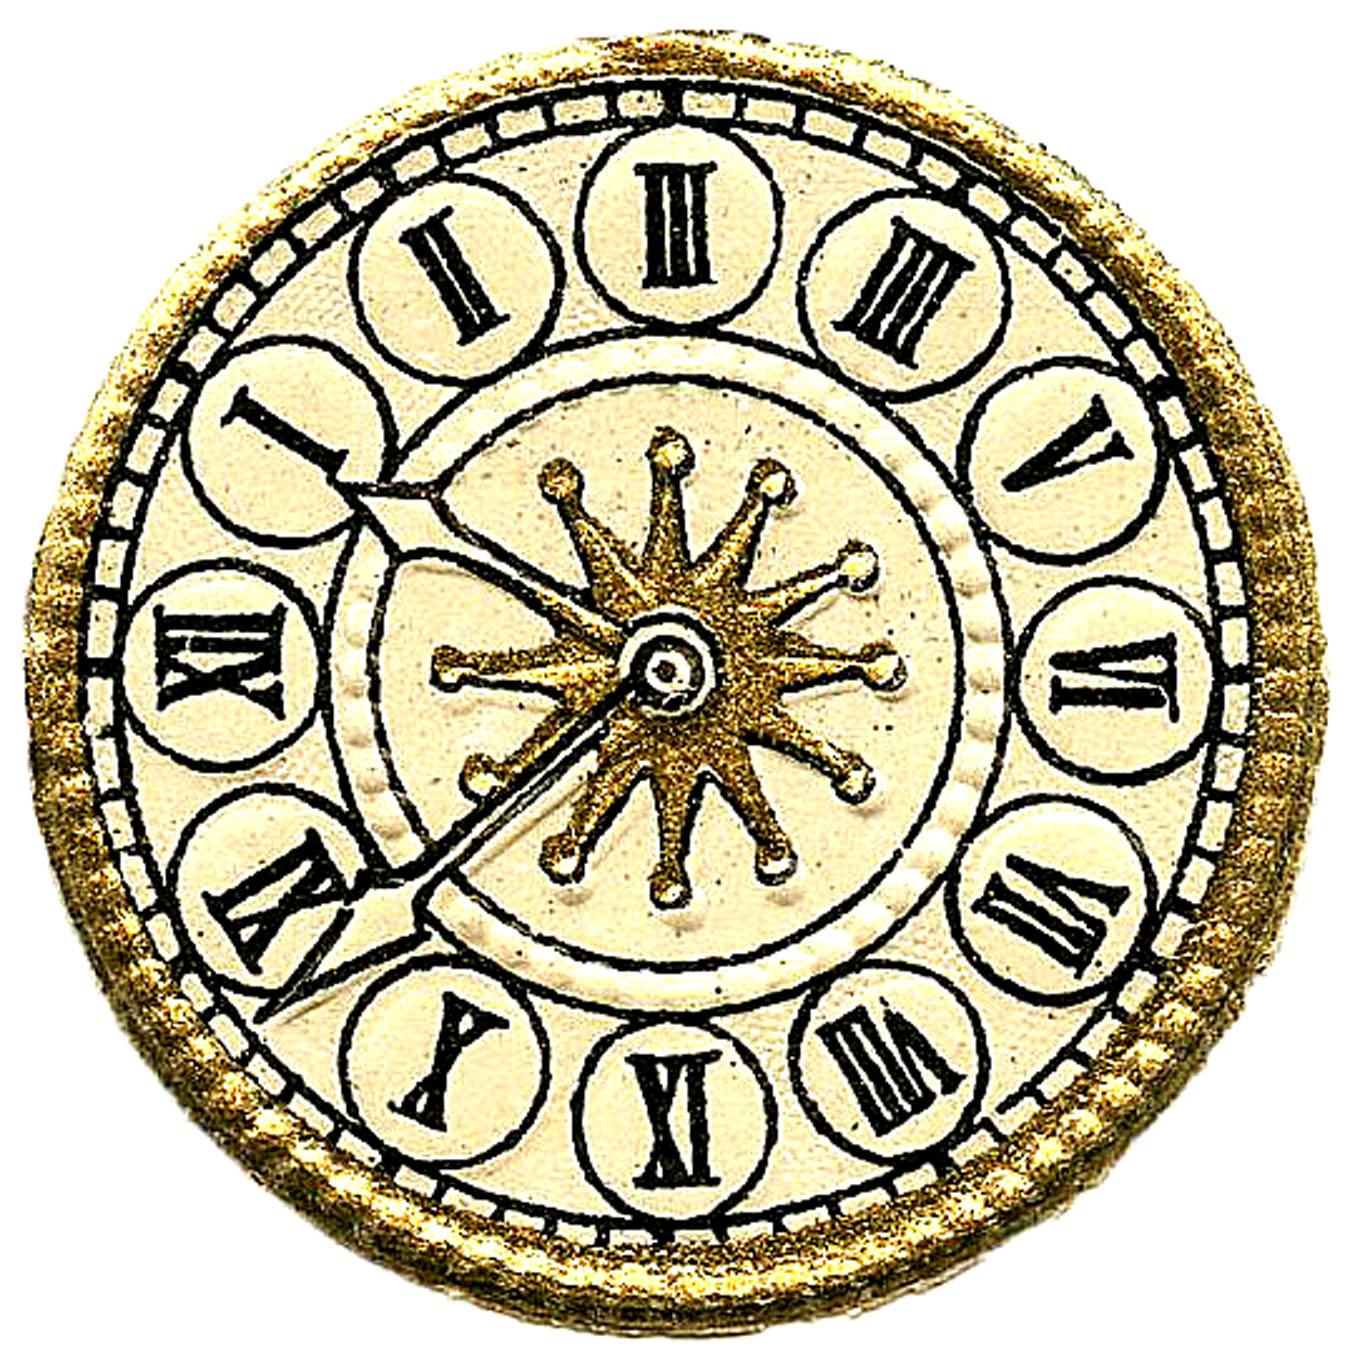 Steampunk clipart antique clock More Clock Steampunk Faces Images